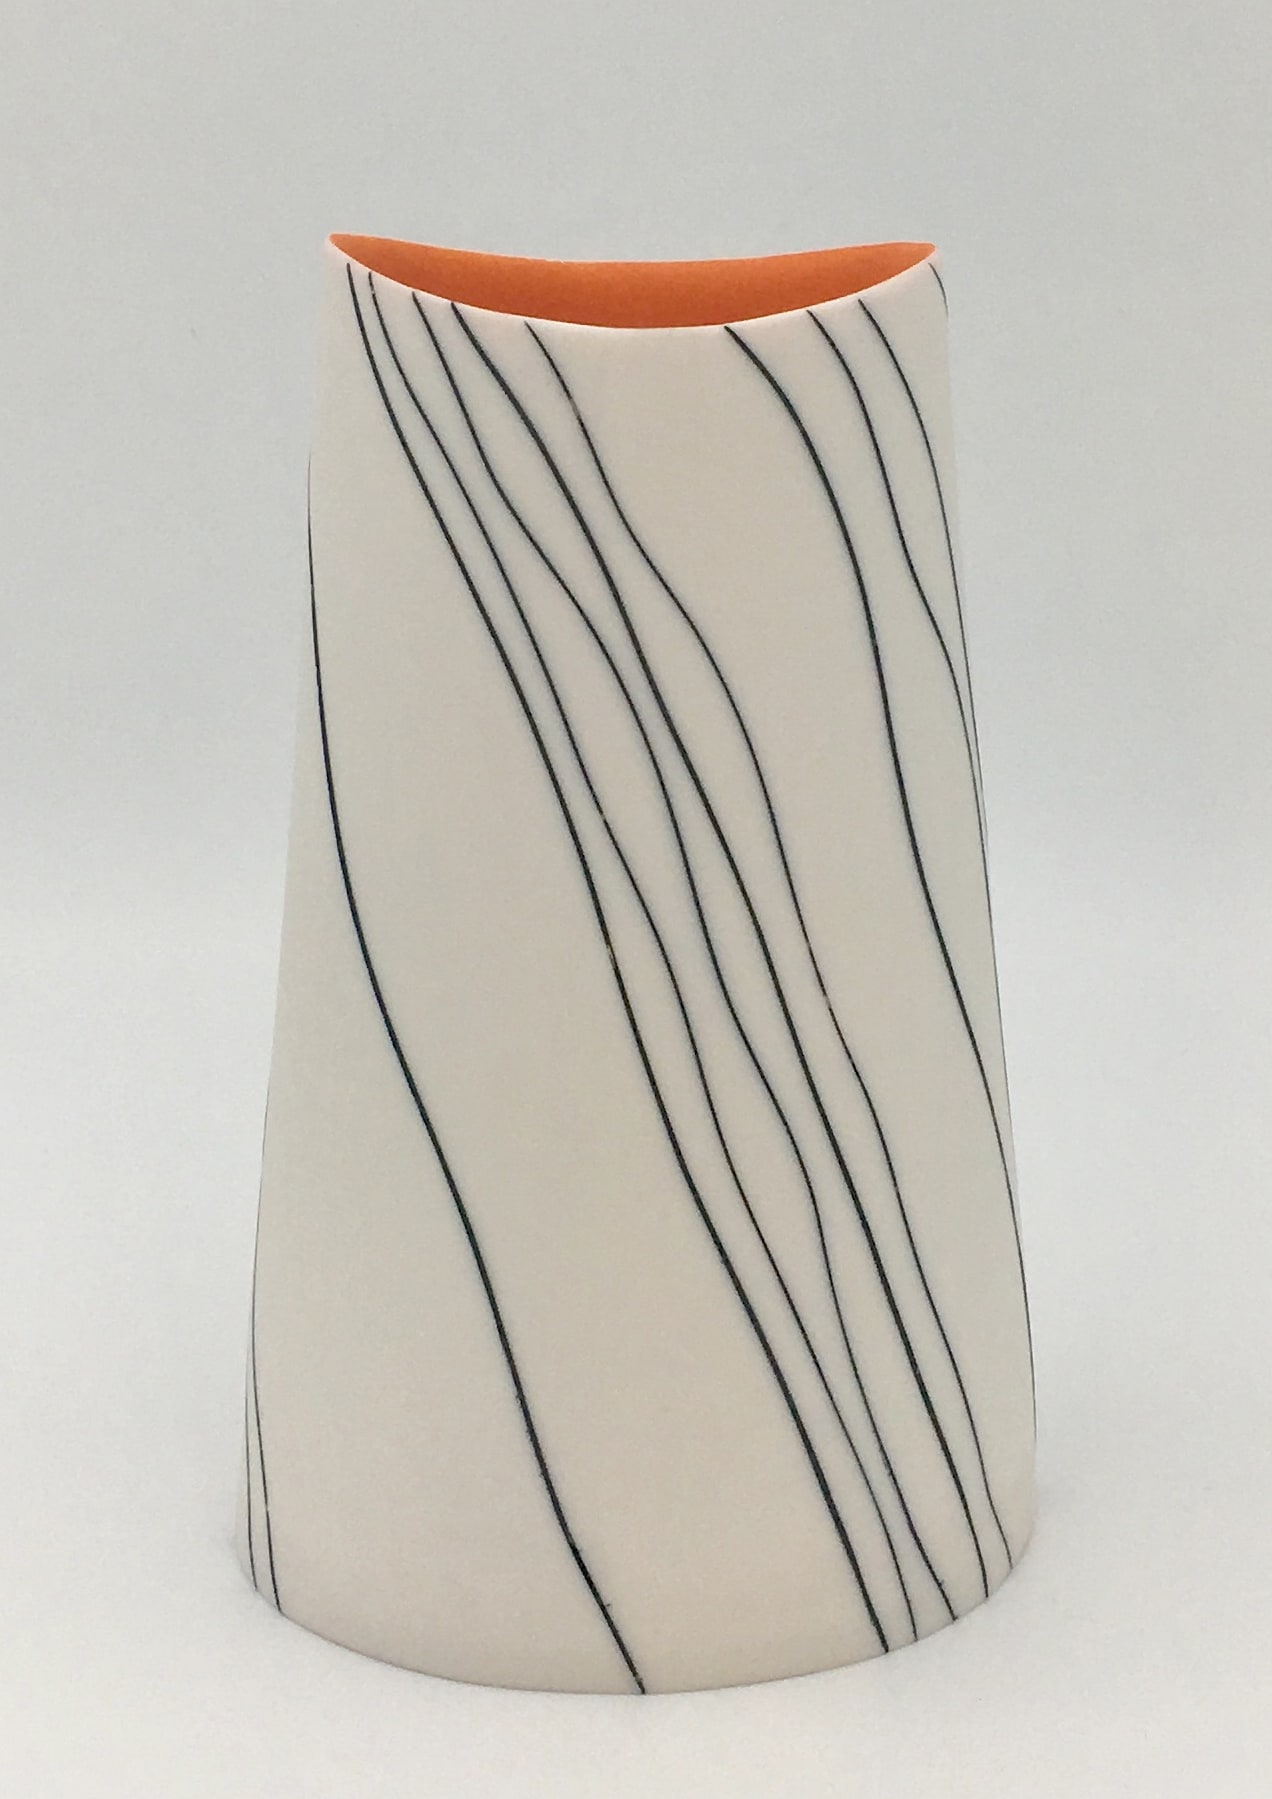 "<span class=""link fancybox-details-link""><a href=""/artists/195-lara-scobie/works/6527-lara-scobie-oval-vase-with-wave-stripes-2019/"">View Detail Page</a></span><div class=""artist""><strong>Lara Scobie</strong></div> b. 1967 <div class=""title""><em>Oval Vase with Wave Stripes</em>, 2019</div> <div class=""medium"">Porcelain</div><div class=""copyright_line"">Own Art: £24 x 10 Months, 0% APR</div>"